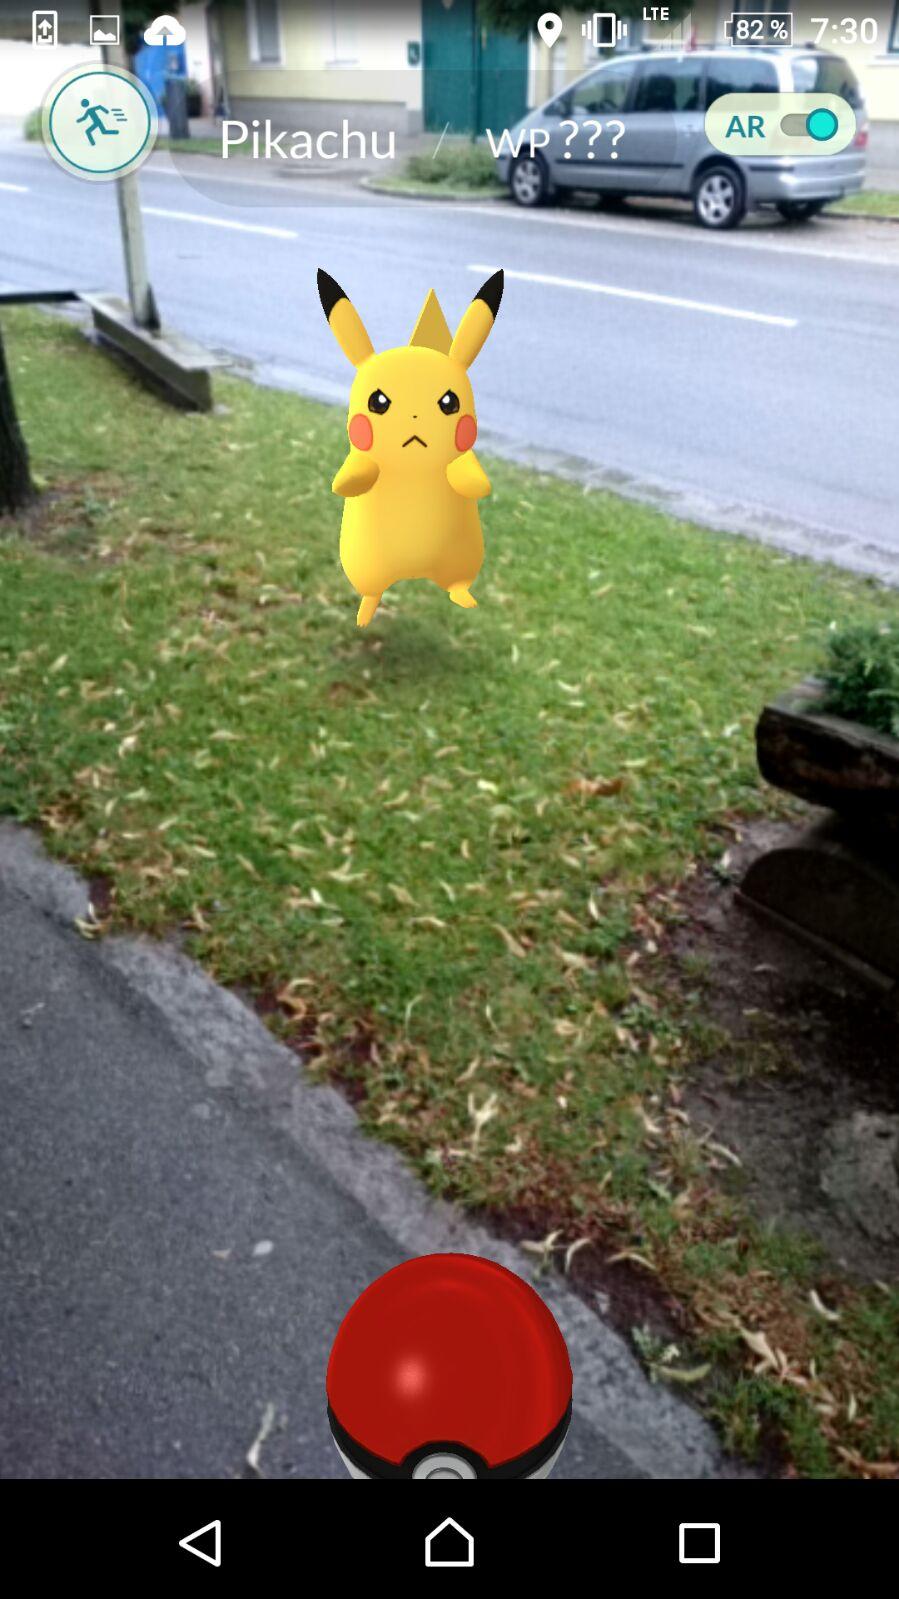 Pikachu fangen